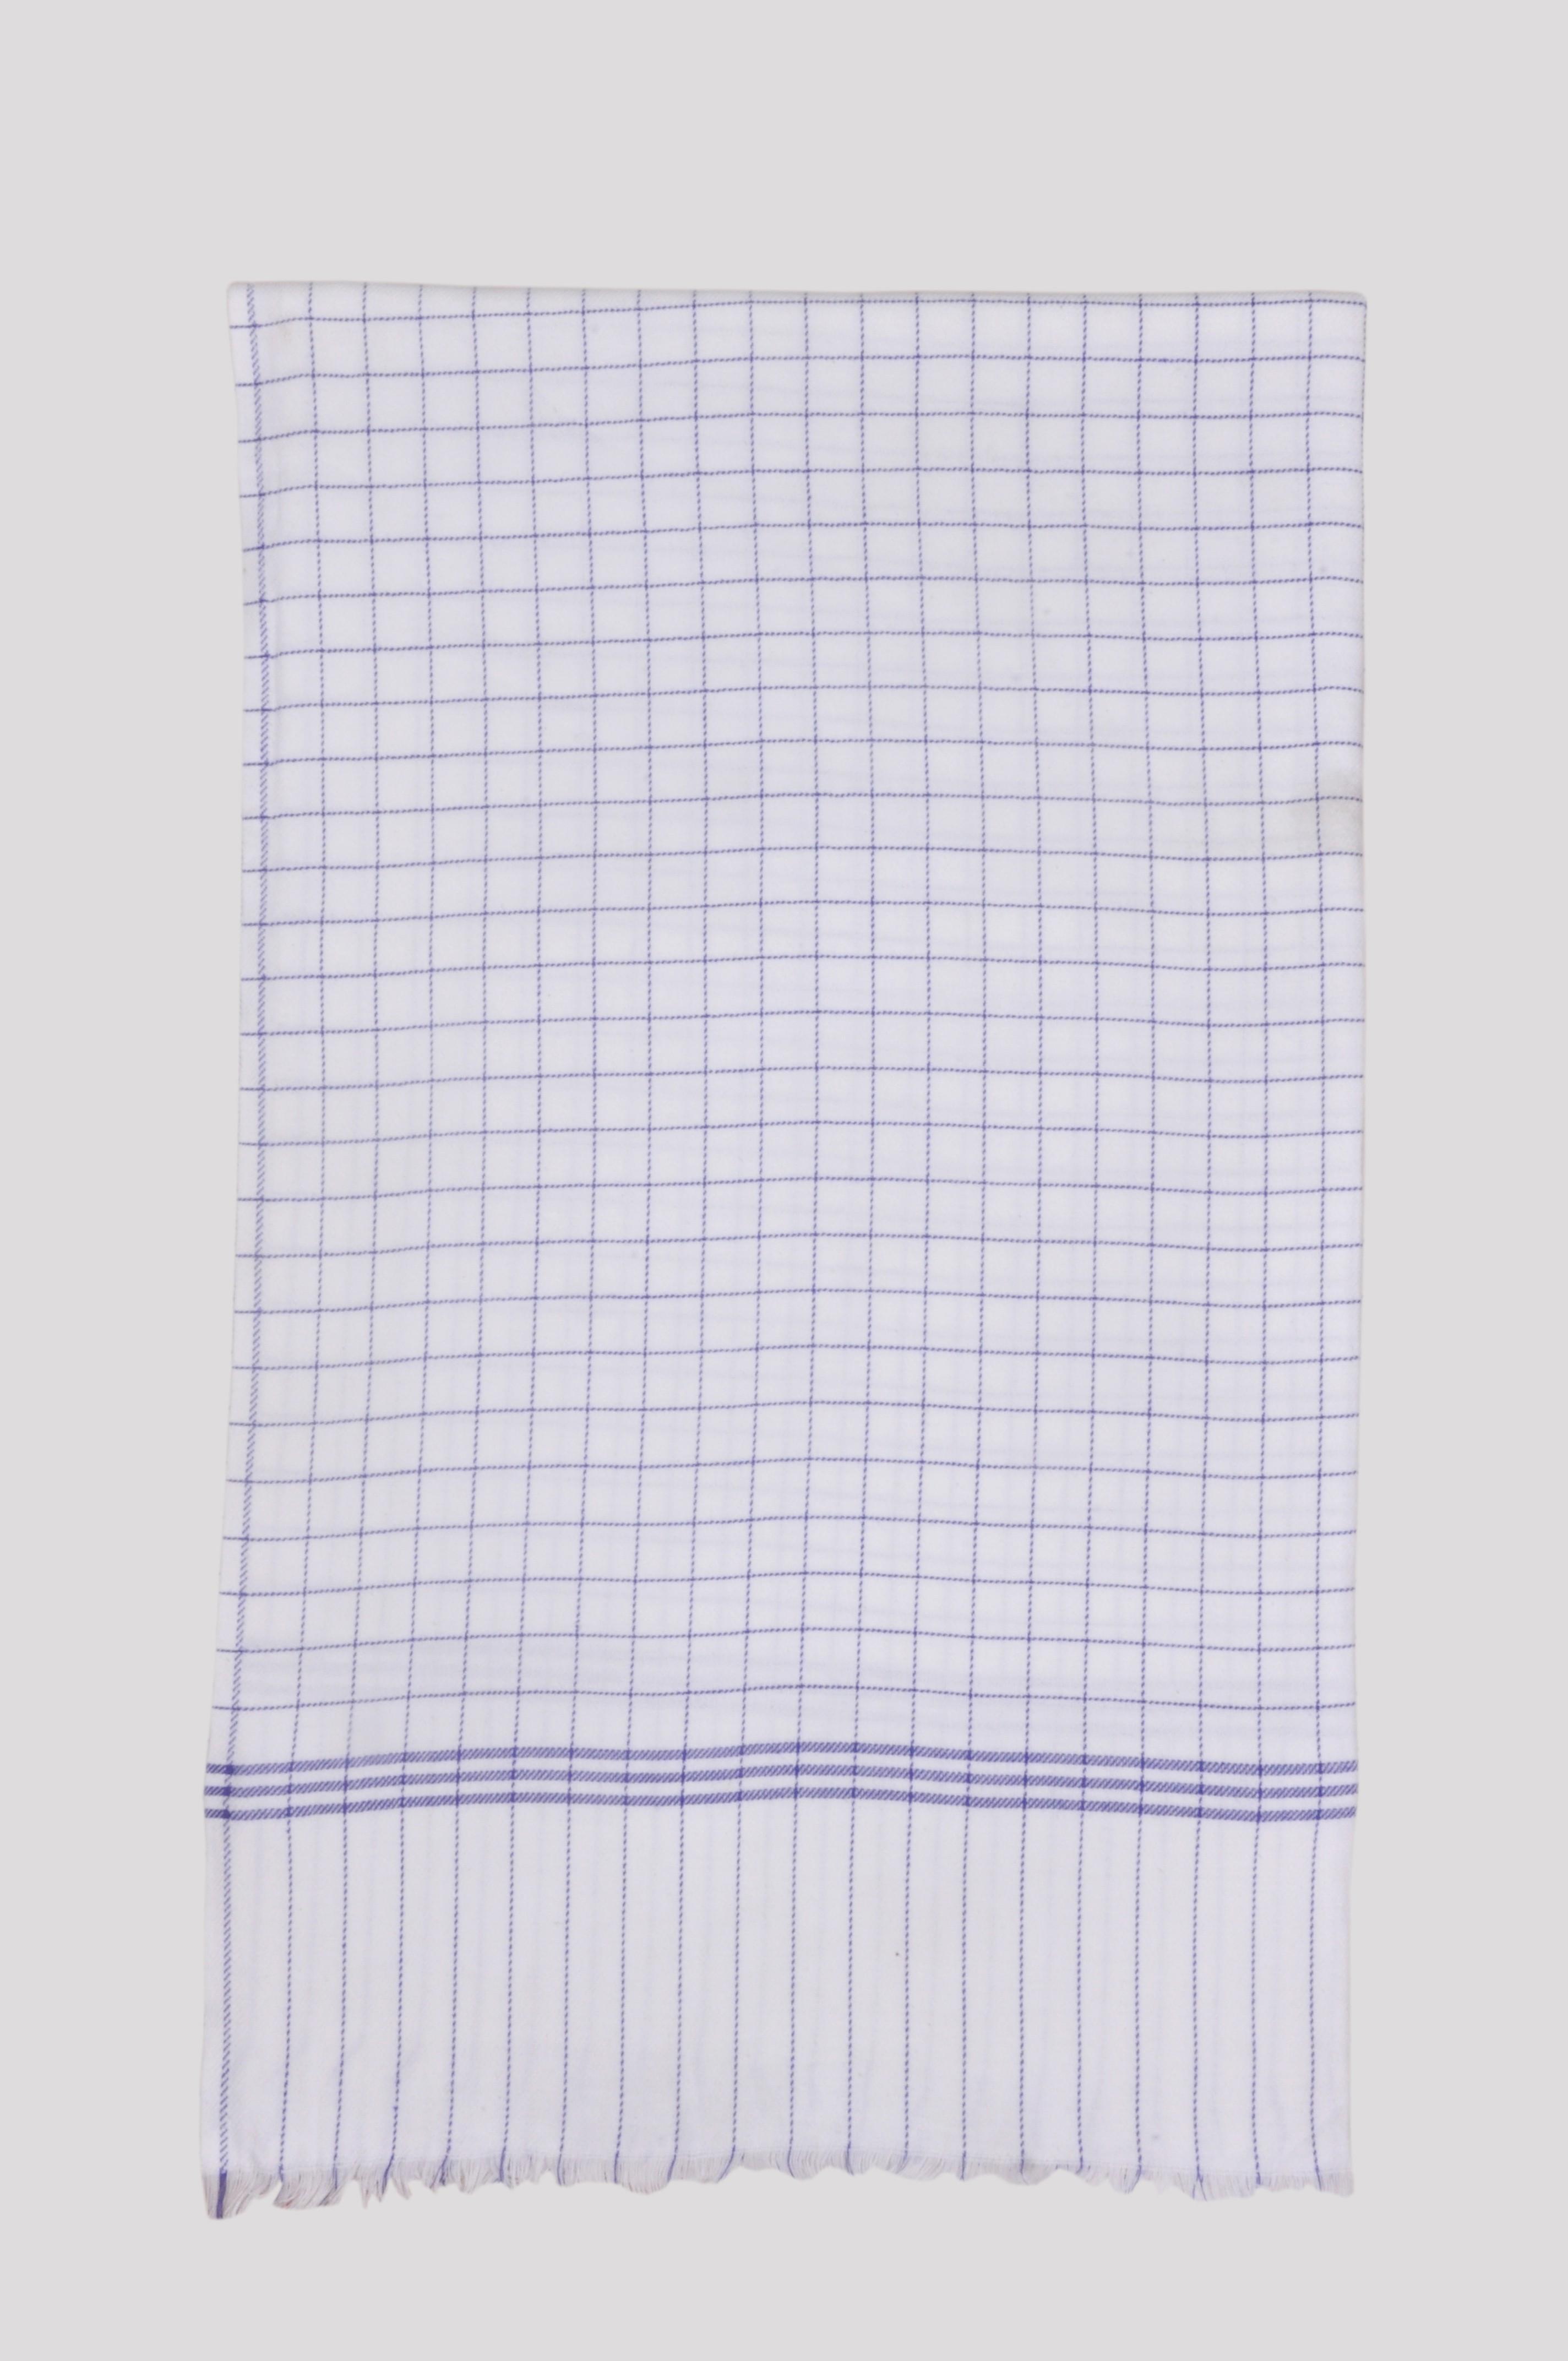 Jass Home Decor Checkered Single Blanket Blue(AC Blanket, Set of 1 Blanket)